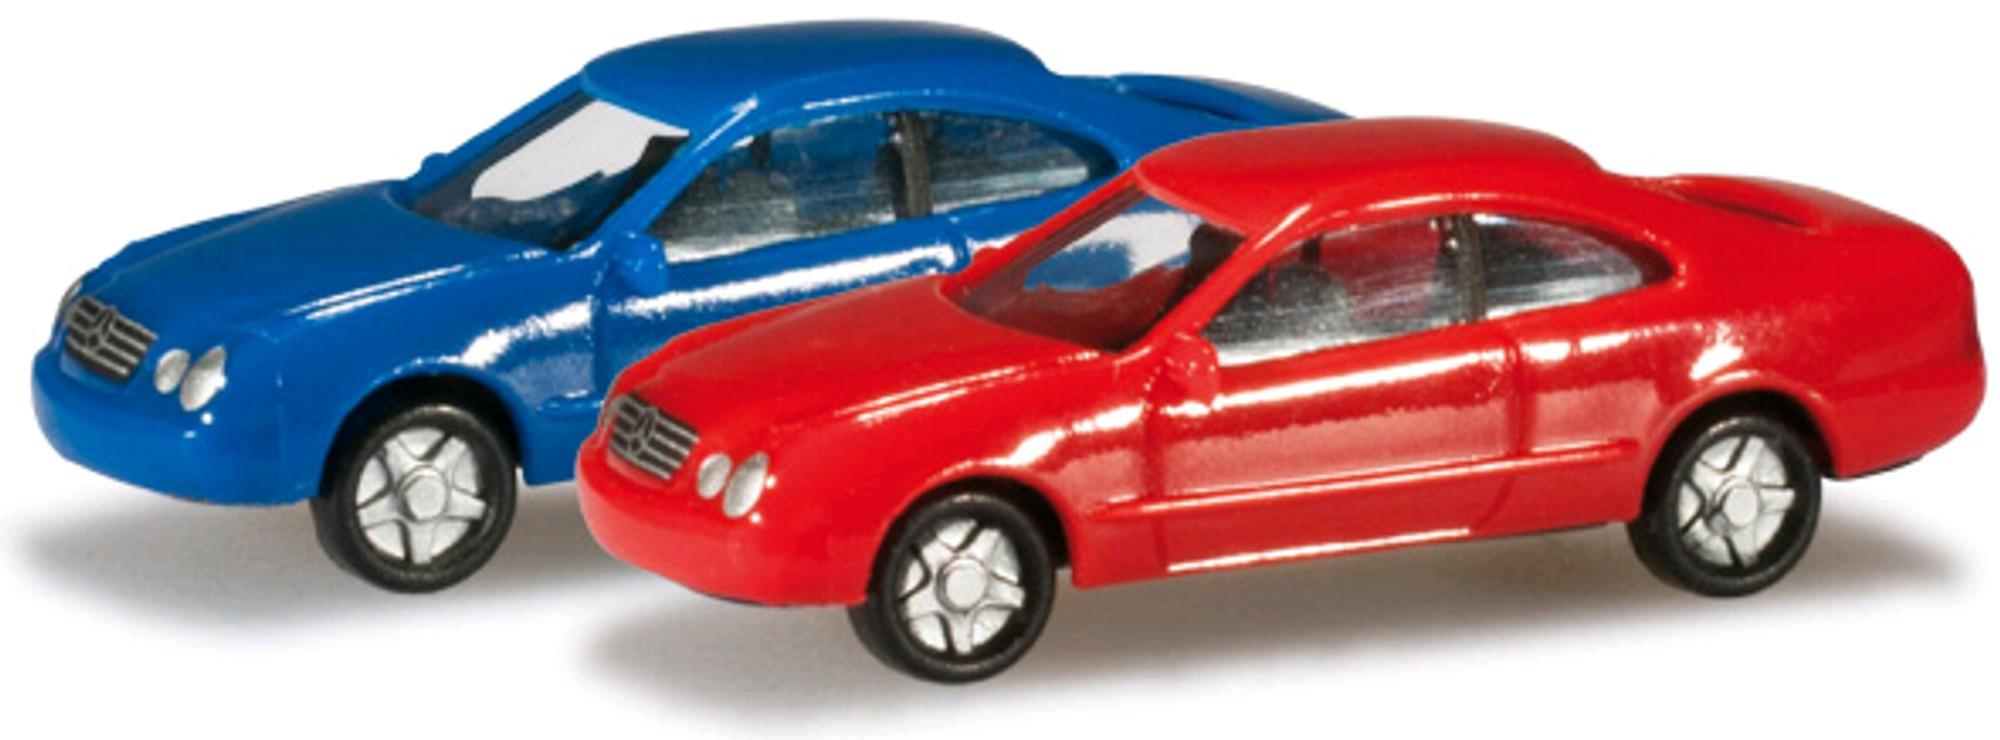 herpa 065146 002 n pkw set mb clk blau rot modellautos 1 160 online kaufen bei modellbau h rtle. Black Bedroom Furniture Sets. Home Design Ideas